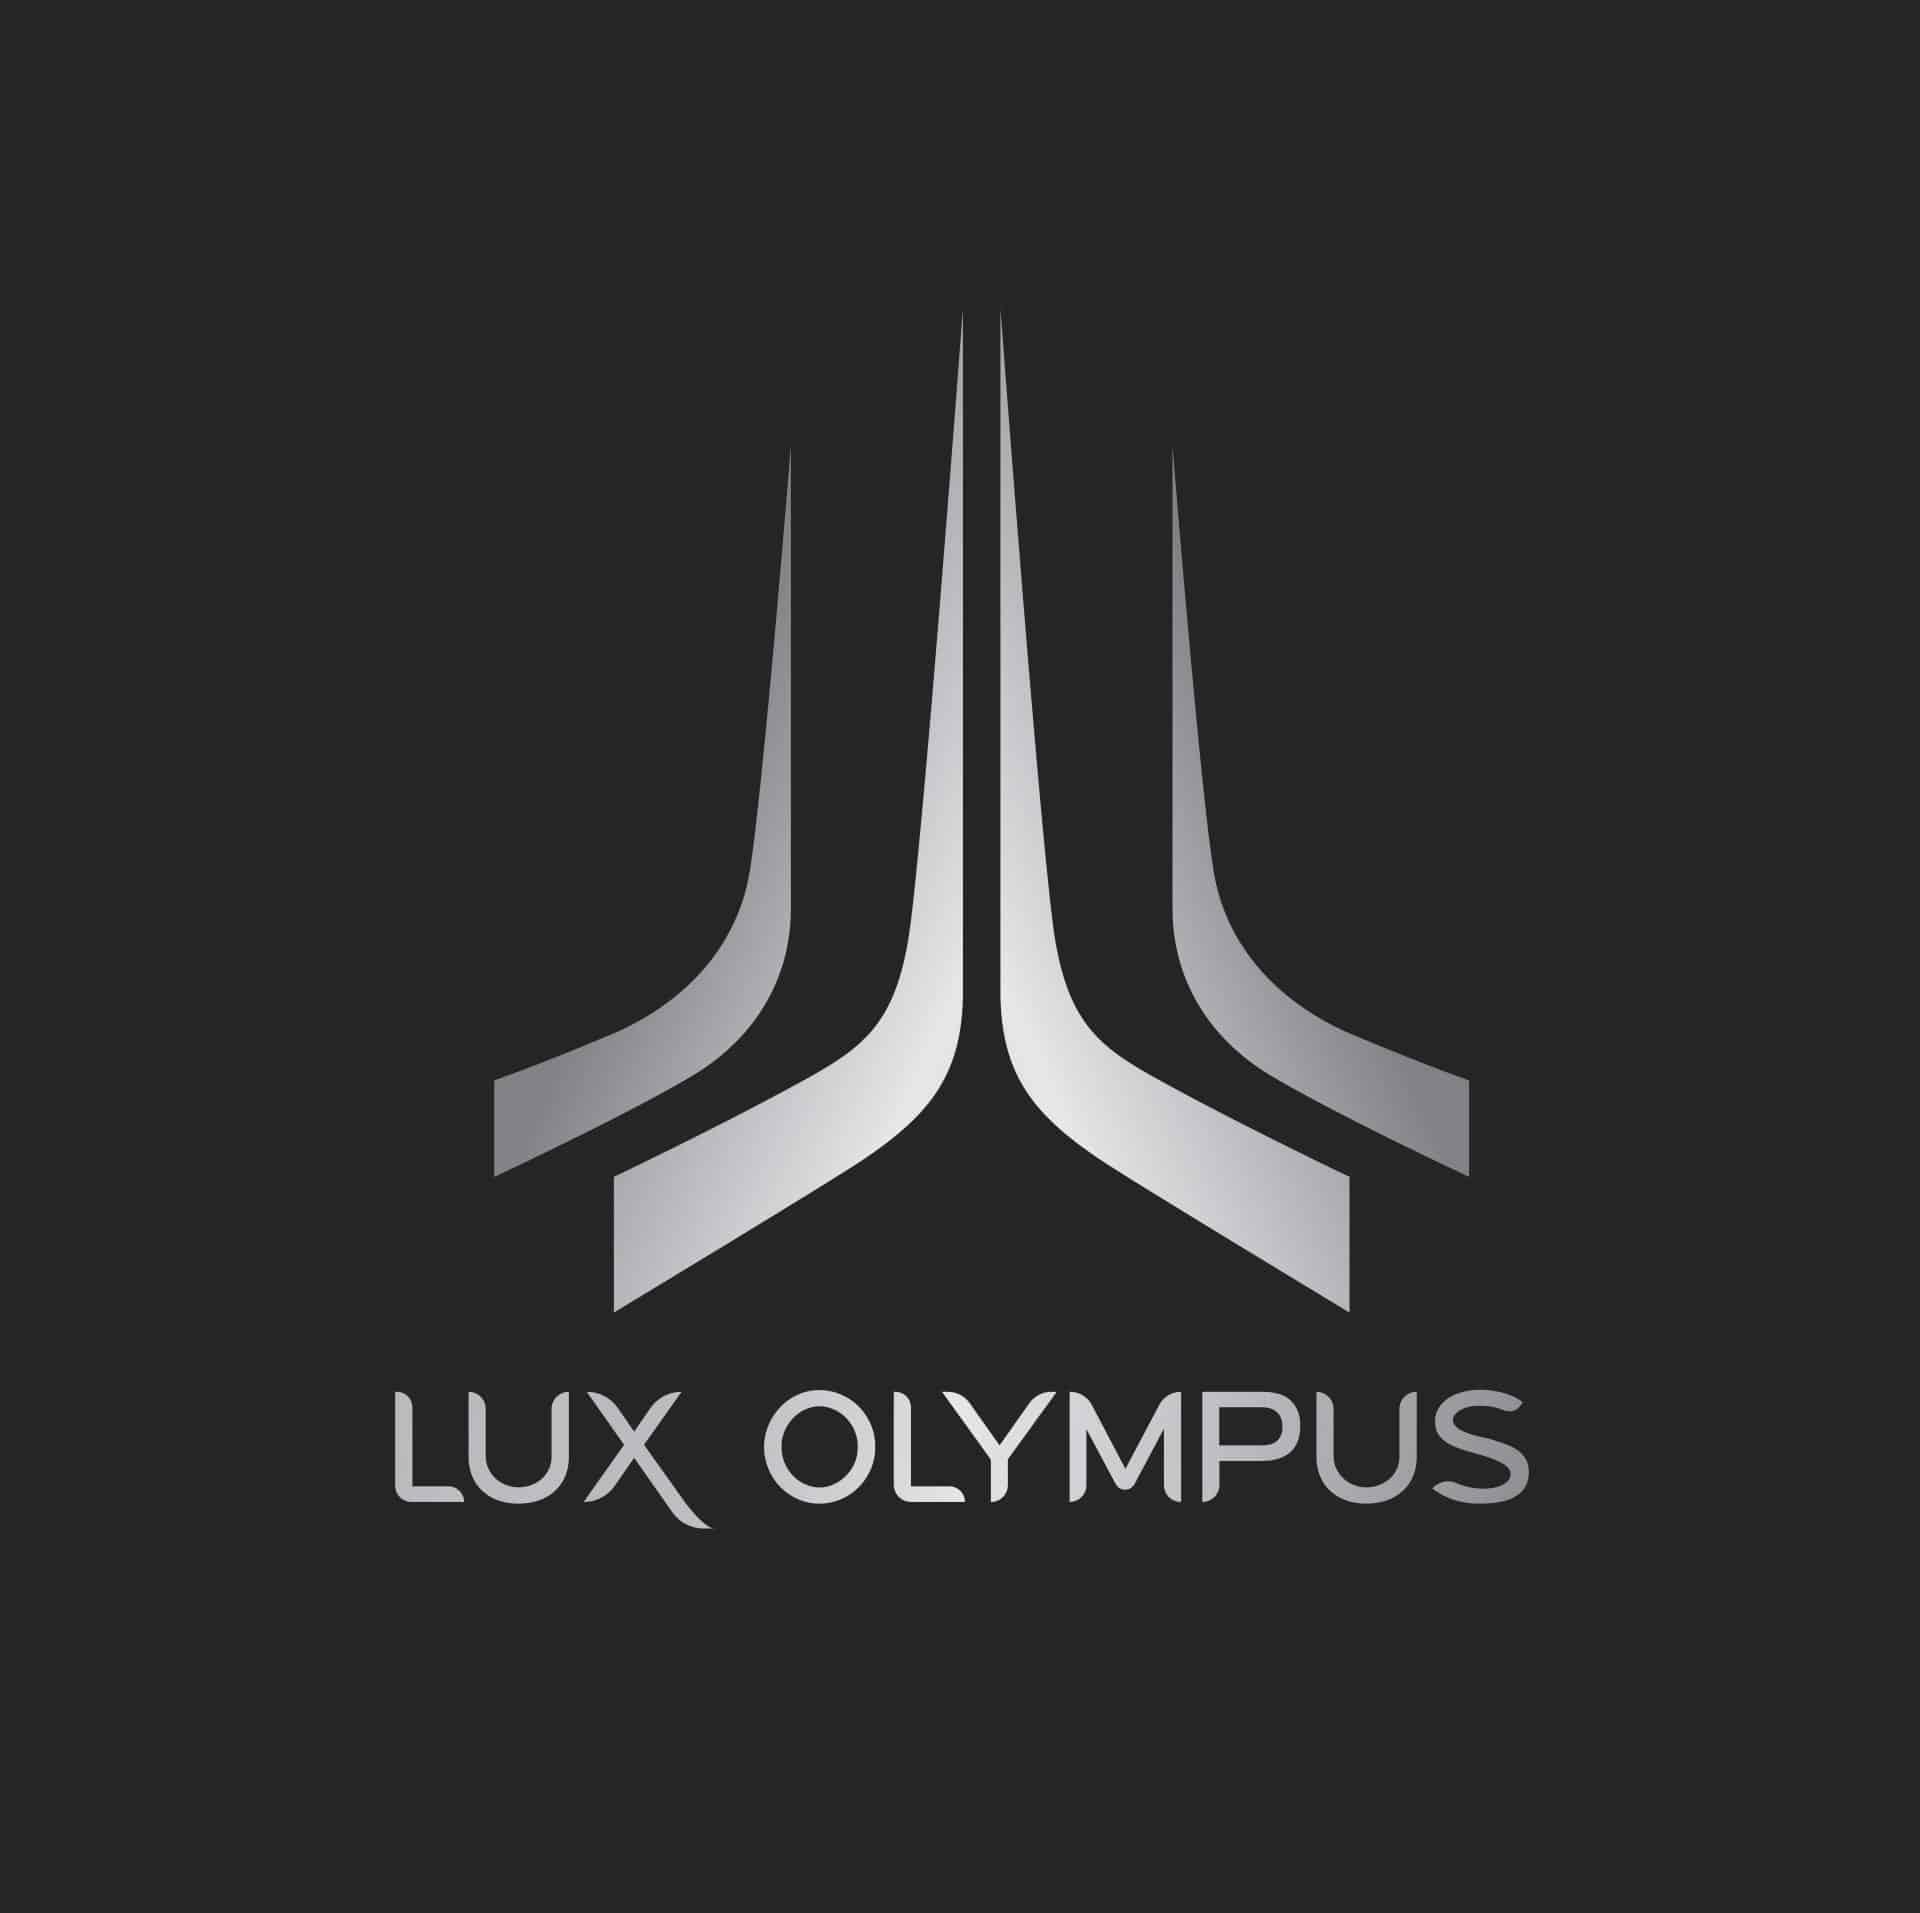 PROPAGANDA - lux olympus logo WHITE